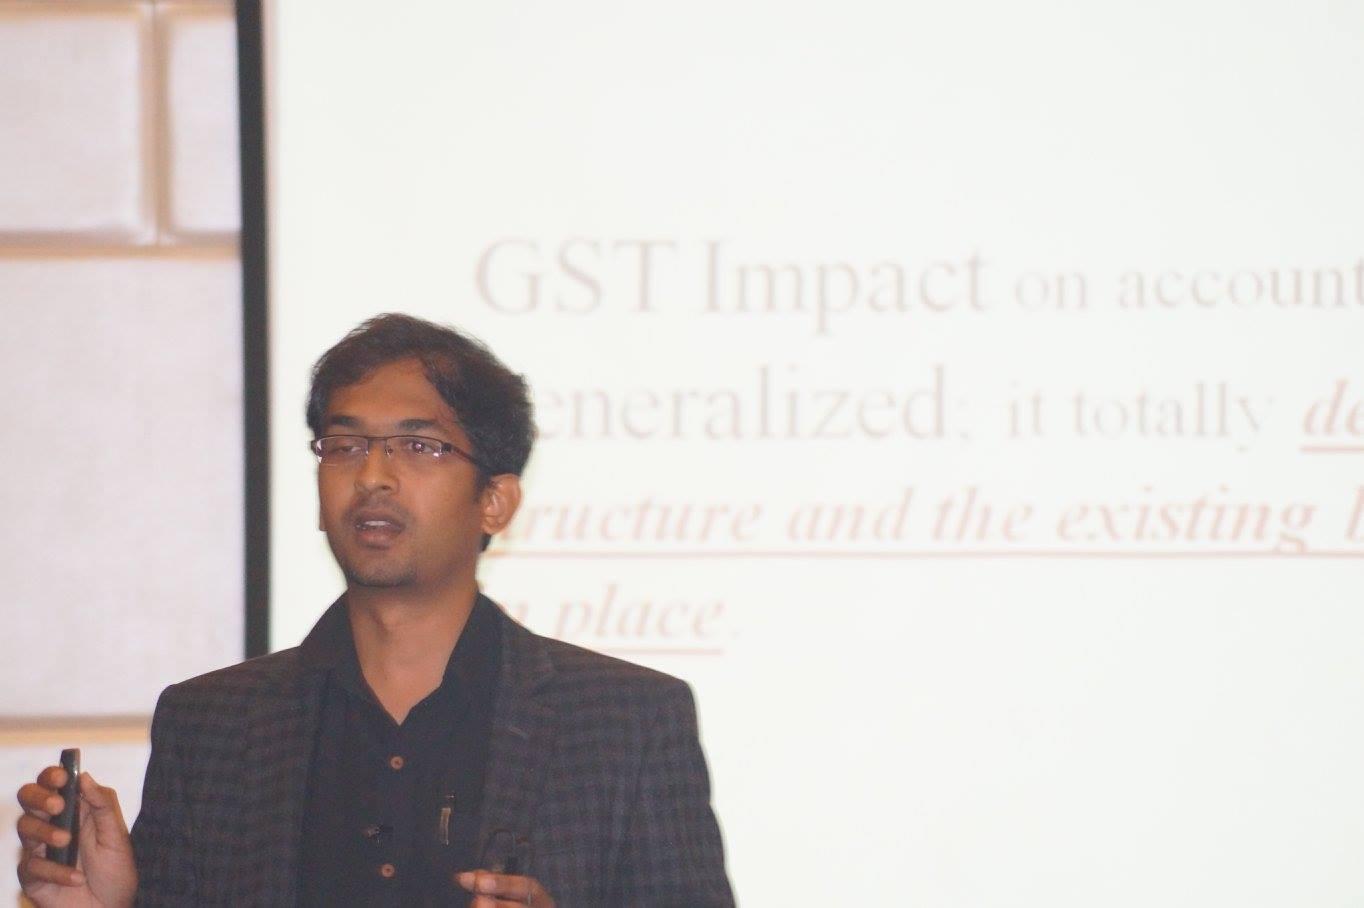 GST Materclass Workshop at Bangalore